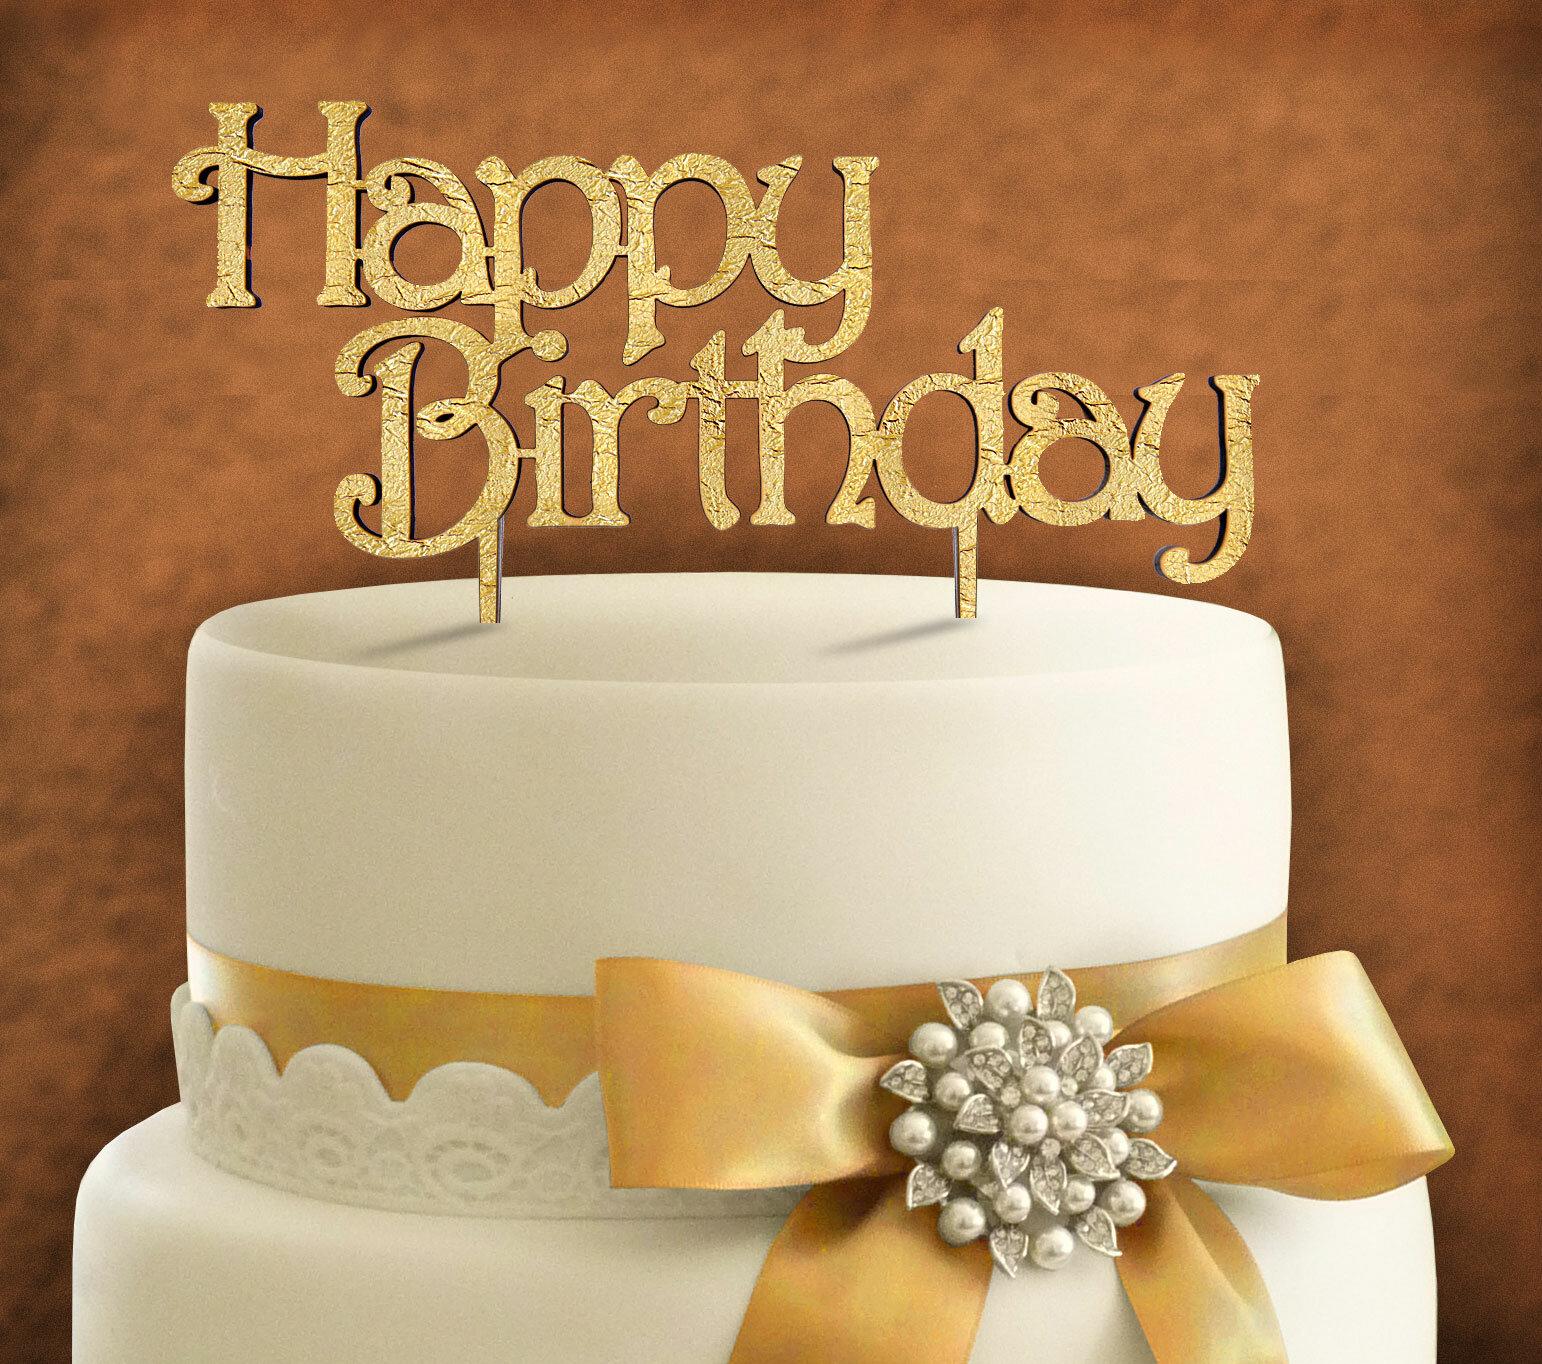 Remarkable Amonogramartunlimited Happy Birthday Cake Topper Wayfair Funny Birthday Cards Online Fluifree Goldxyz